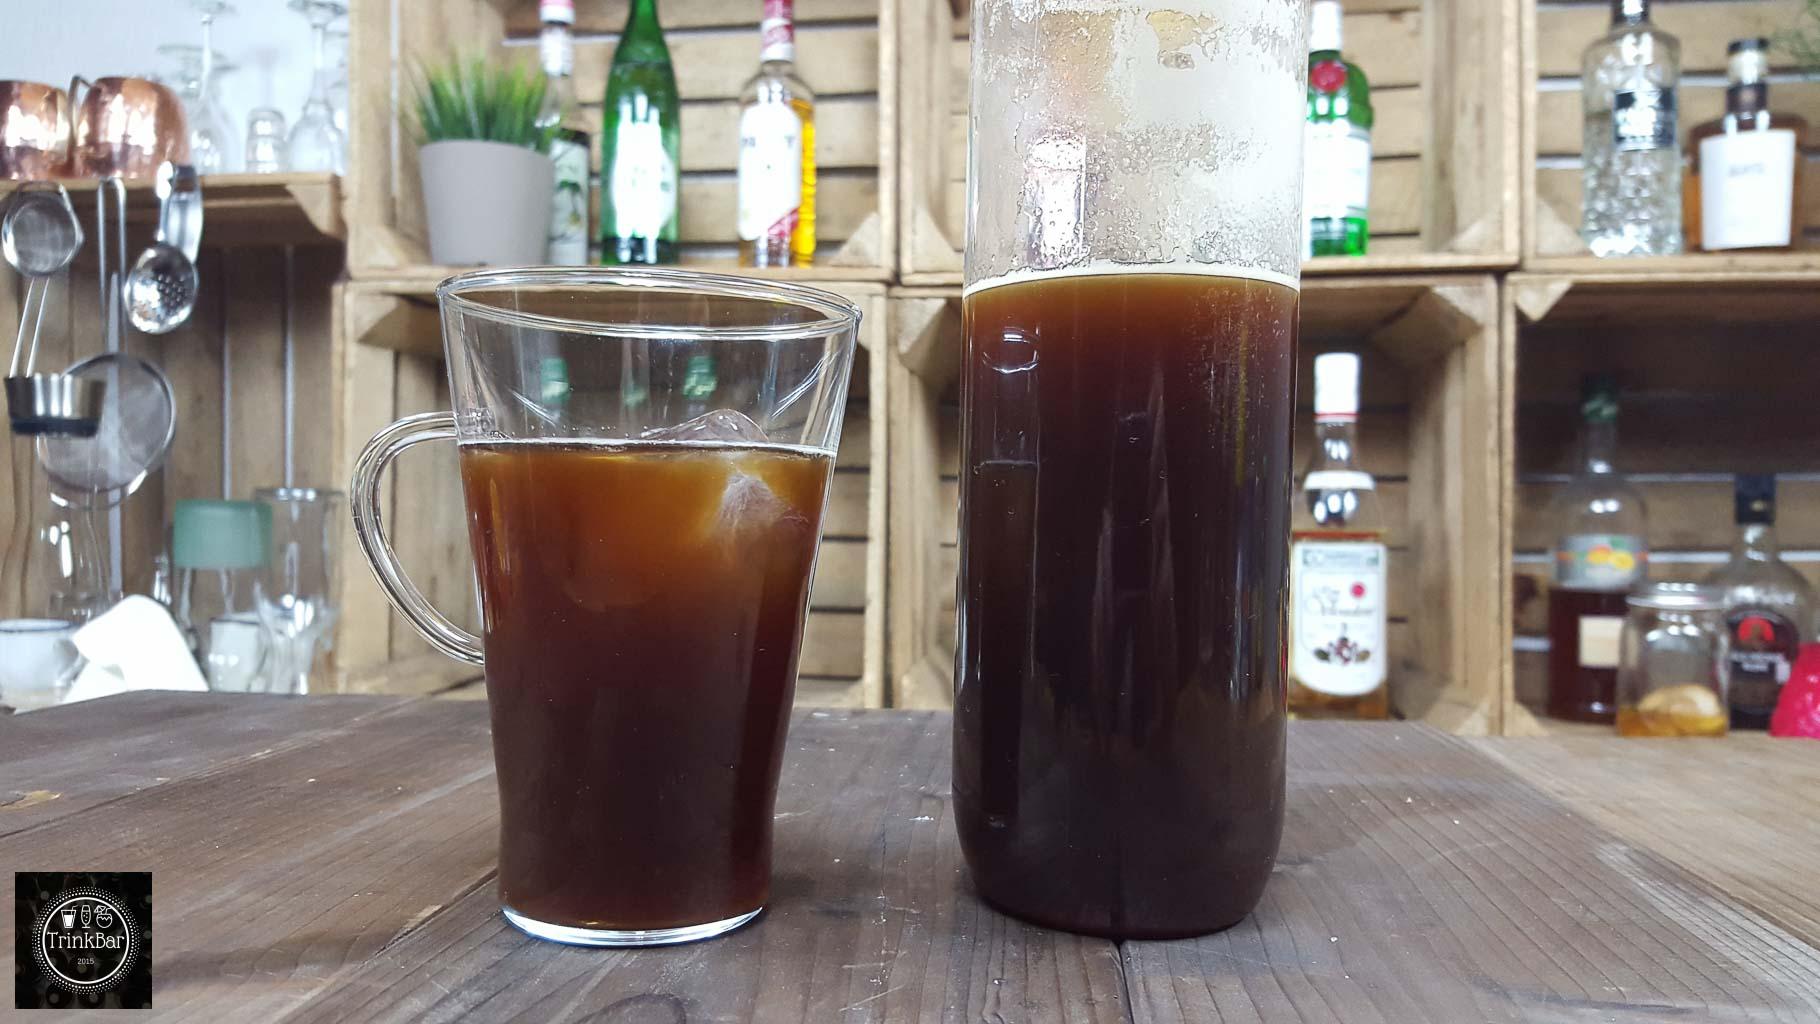 kaltgebr hter kaffee selber machen cold brewed coffee trinkbar nat rlich lecker. Black Bedroom Furniture Sets. Home Design Ideas